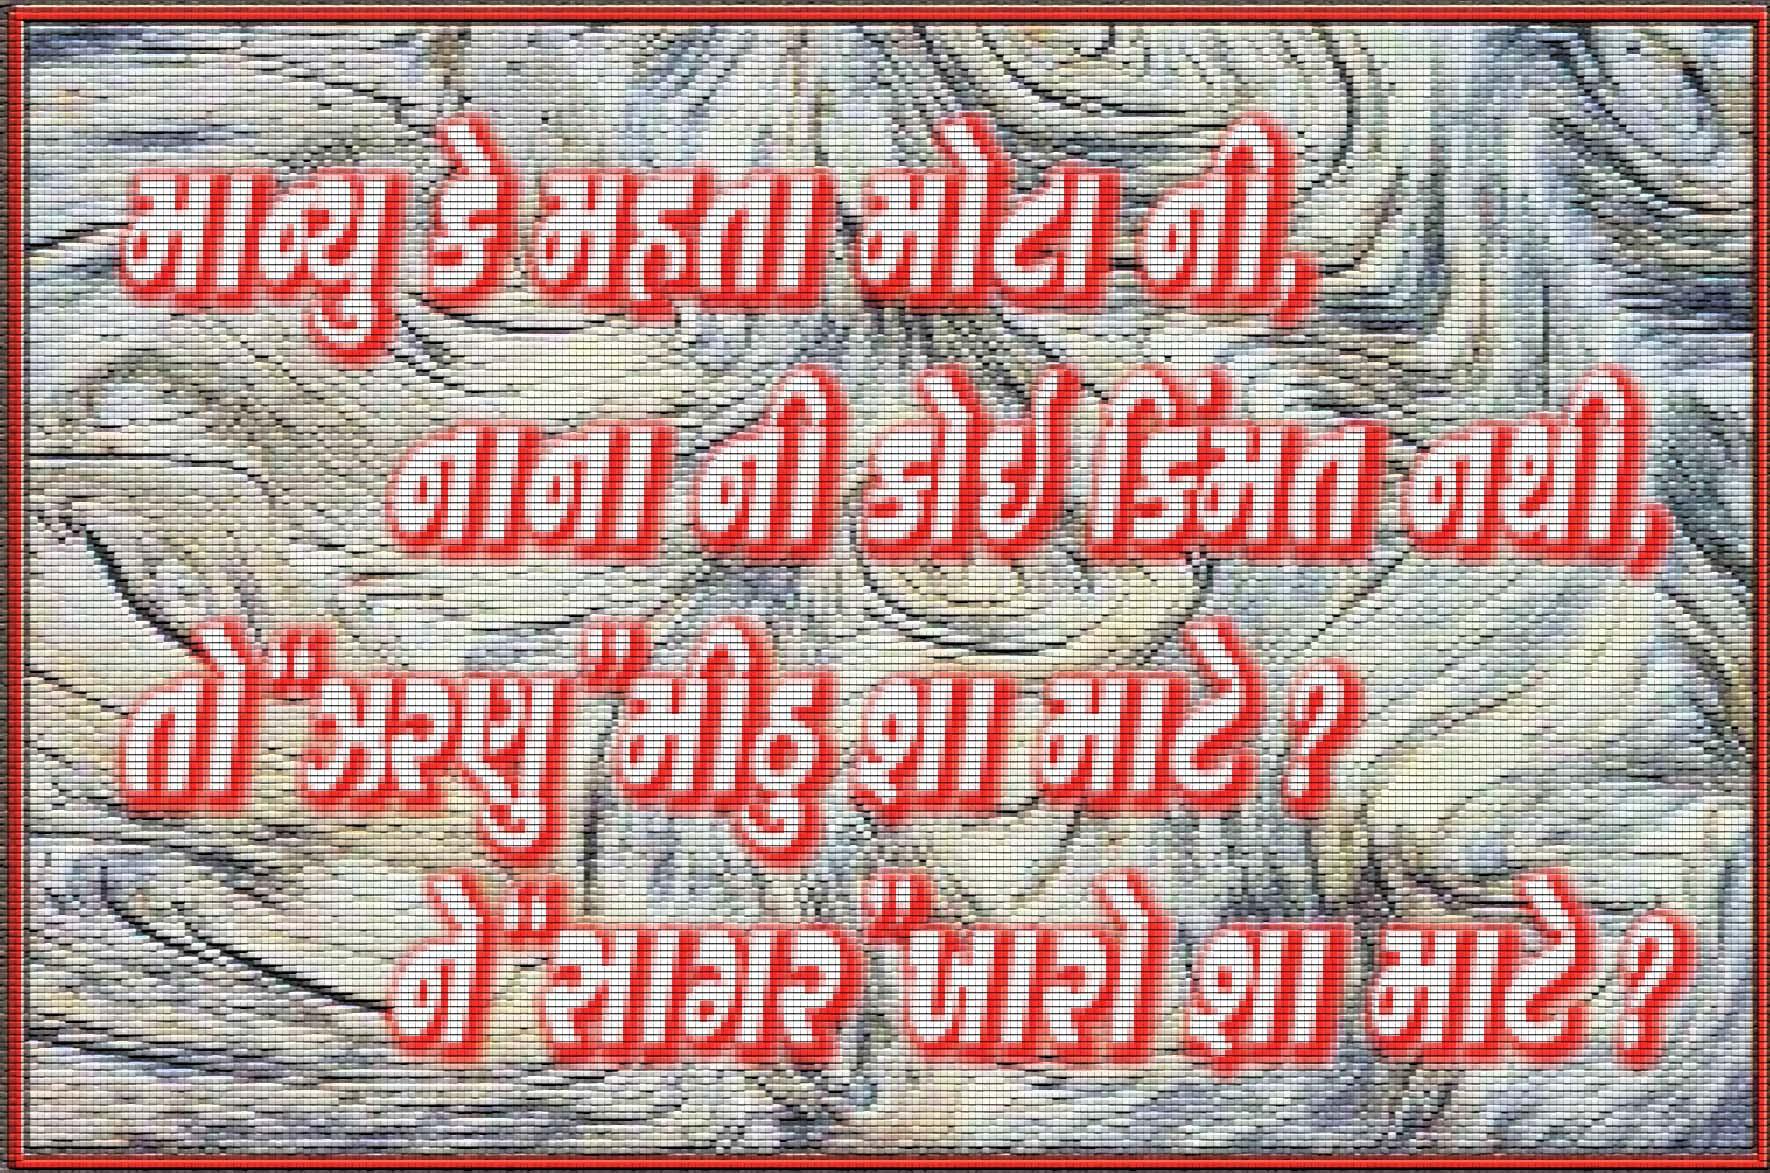 gujarati-suvichar-15.jpg